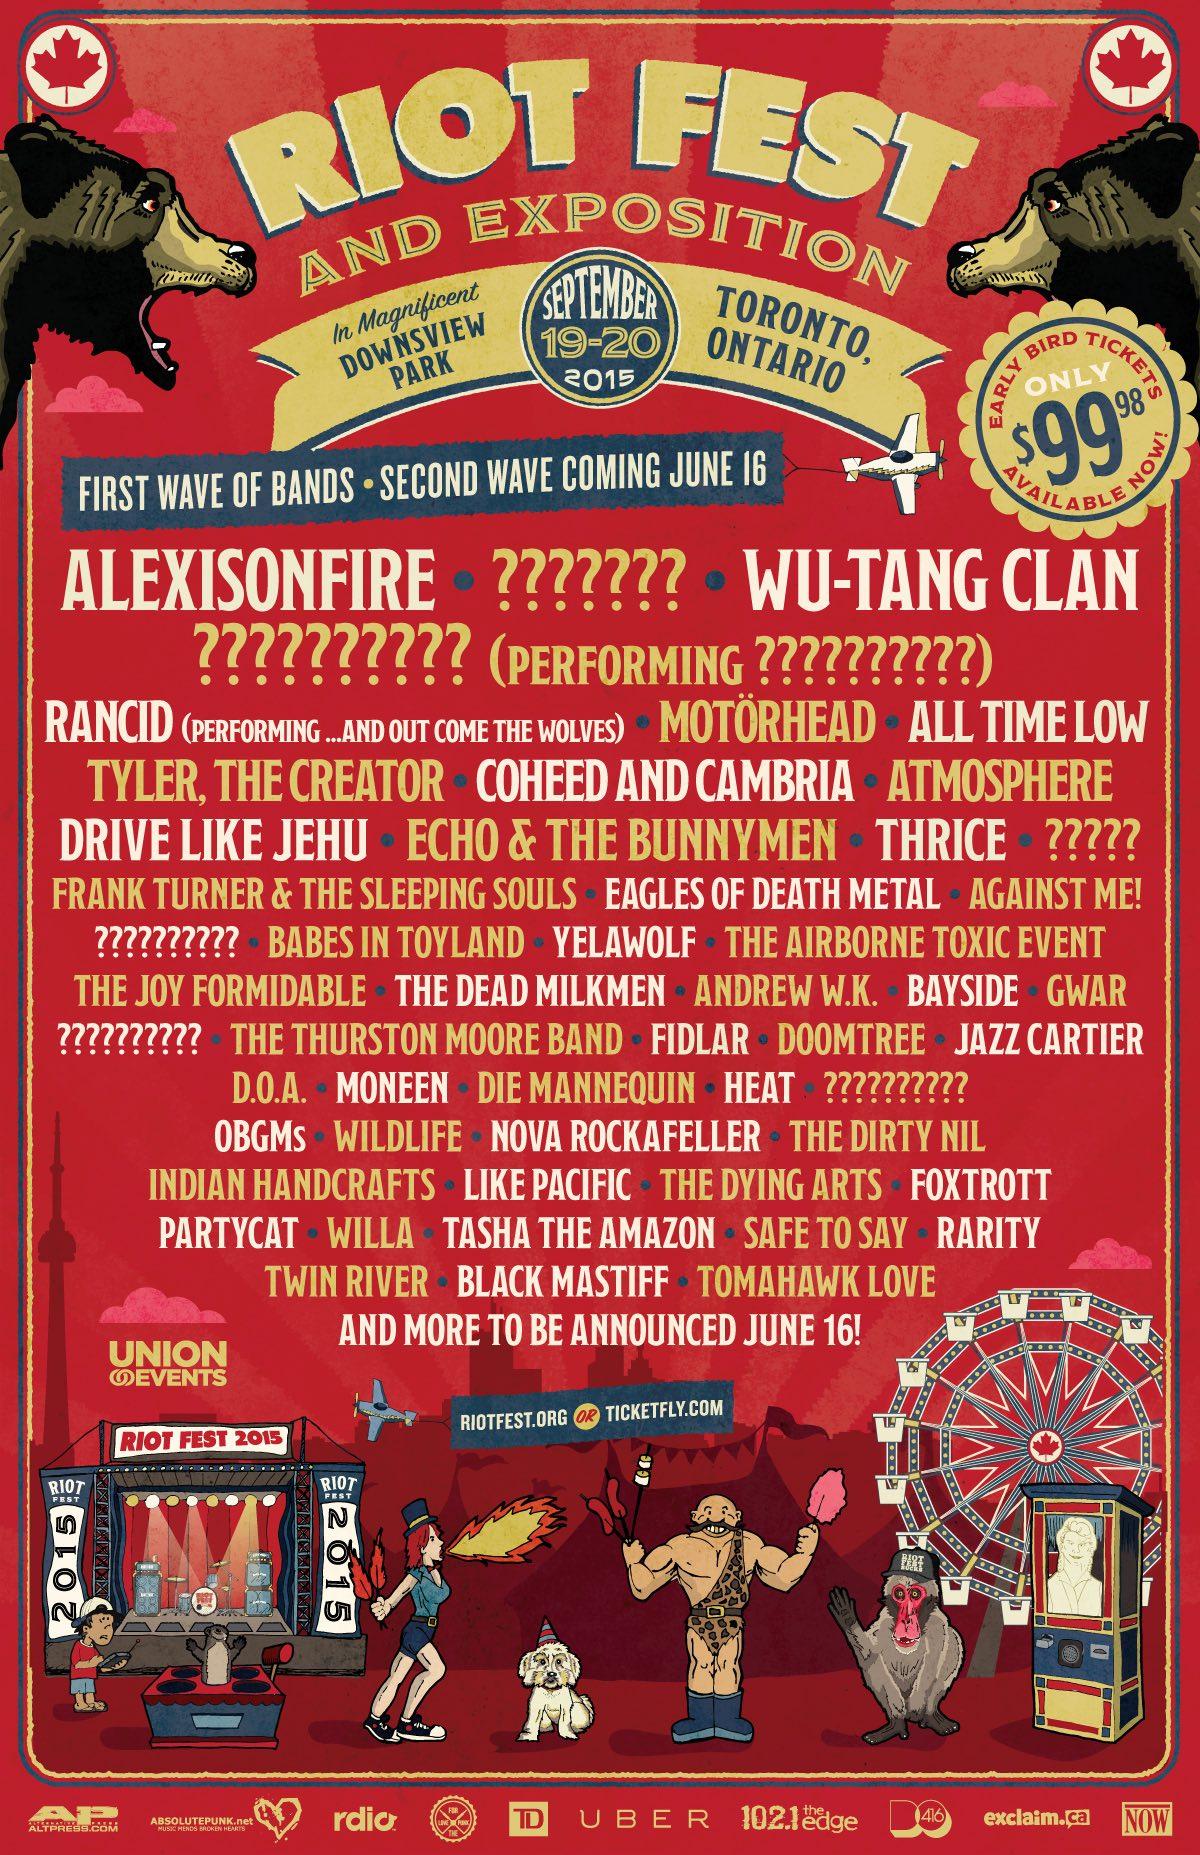 Riot Fest - Toronto 2015